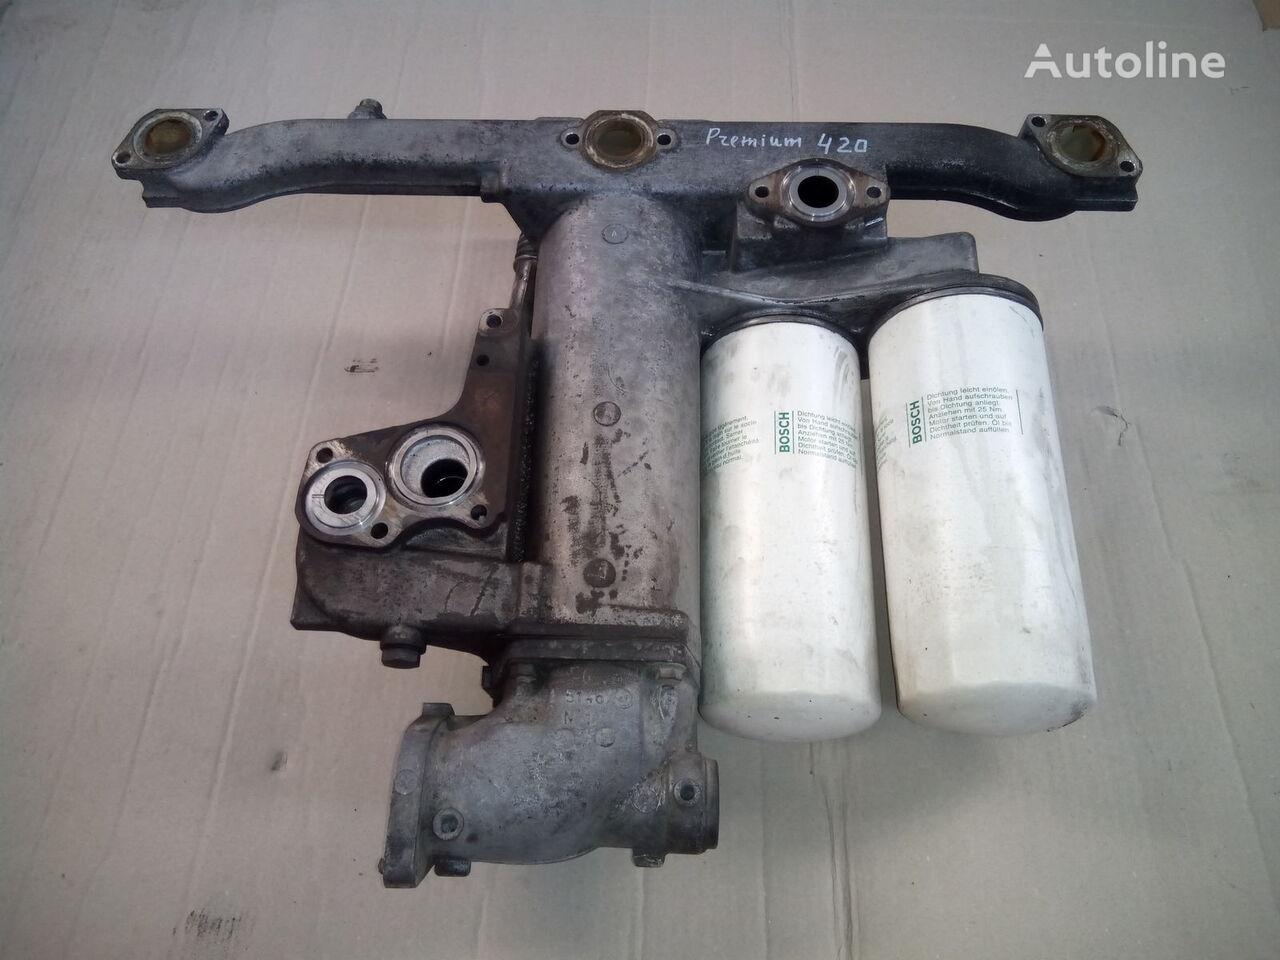 Теплообменник рено премиум 420 теплообменник котла daewoo